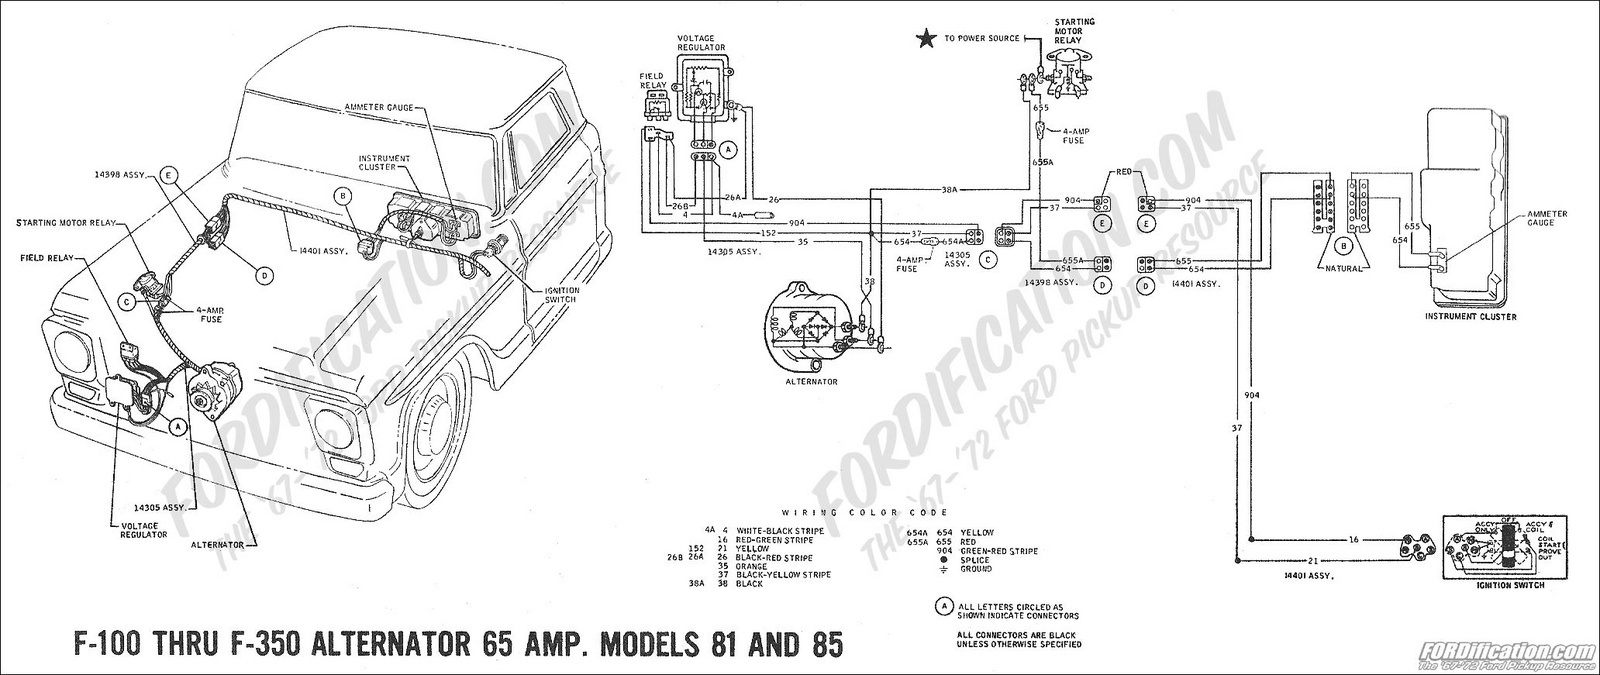 81 Ford F100 Wiring Diagram - Wiring Diagram Data Oreo - Ford Starter Solenoid Wiring Diagram